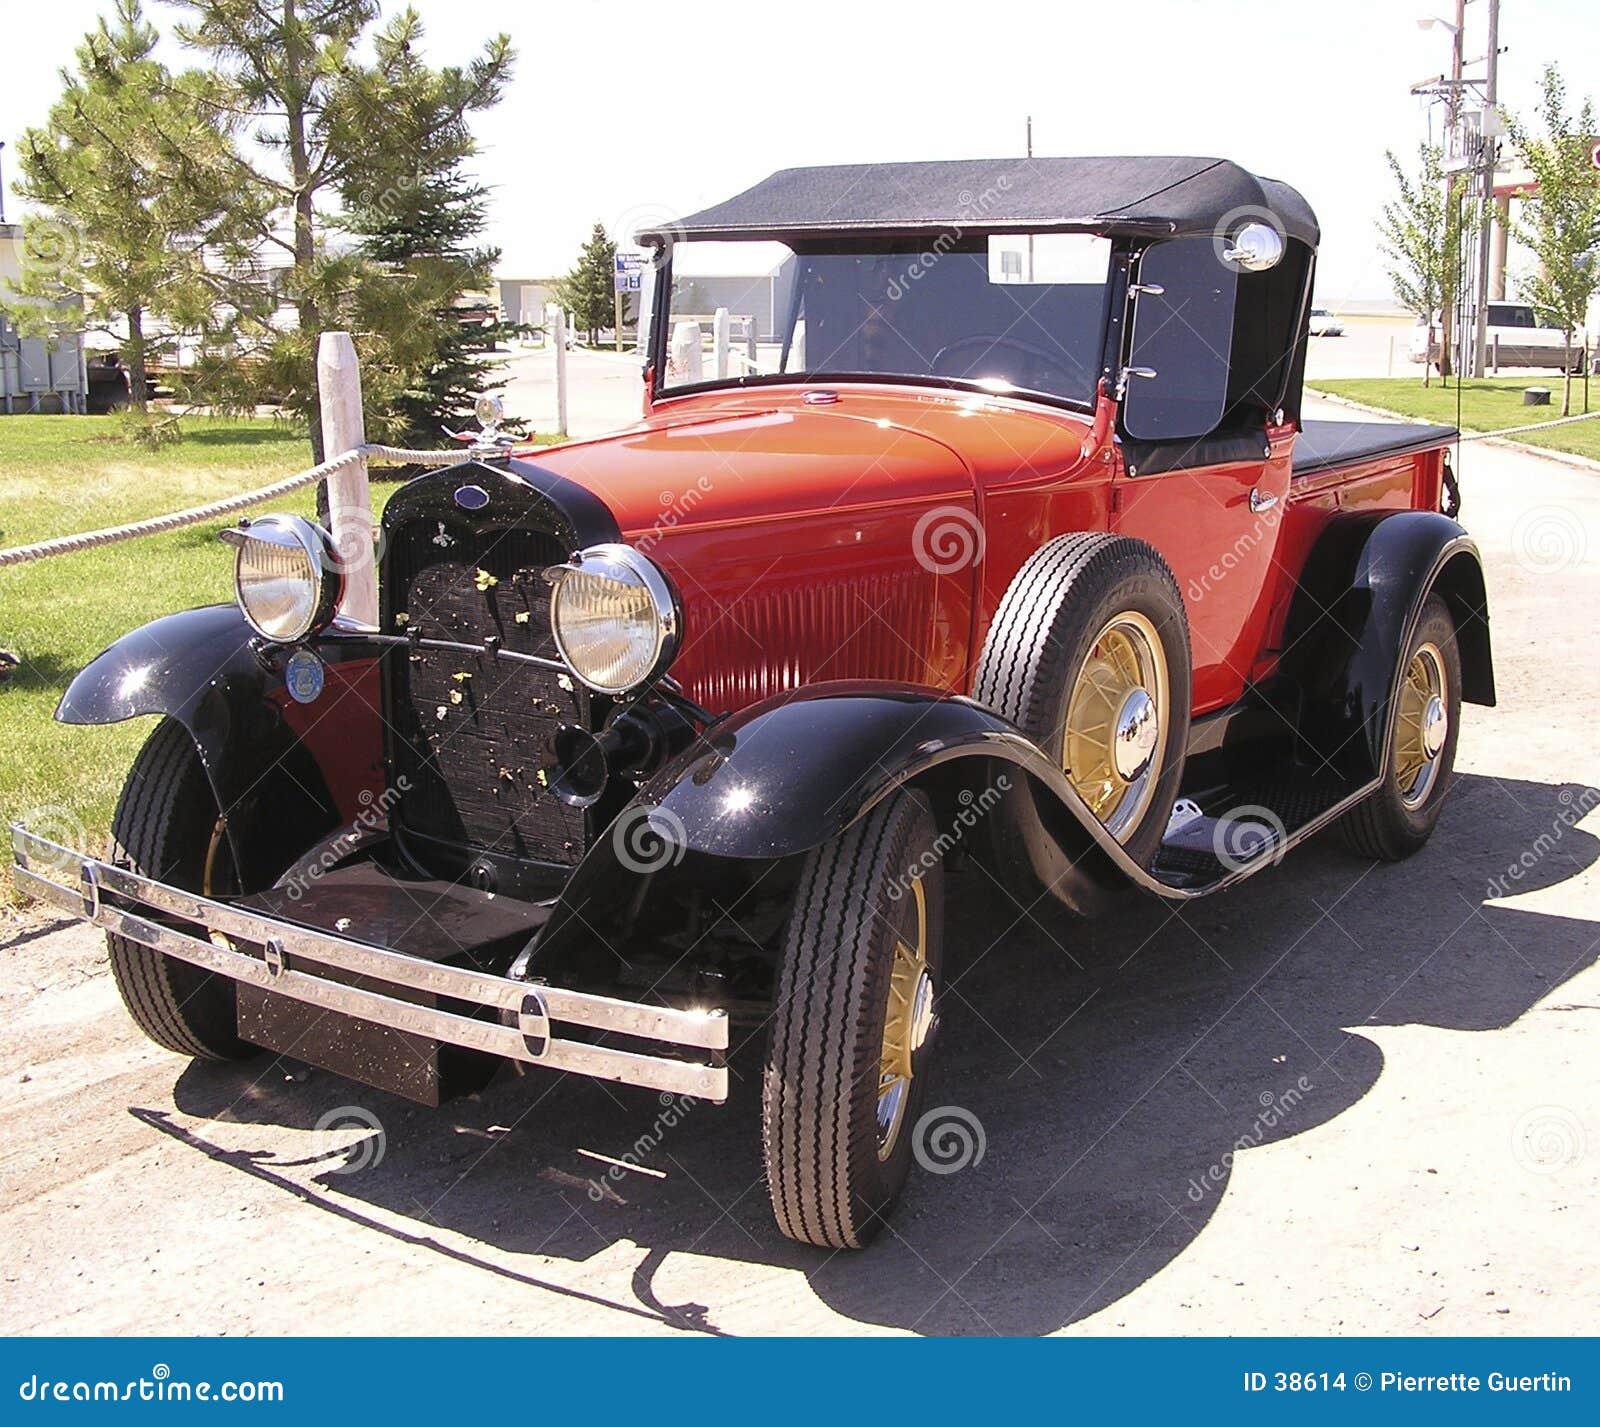 Download Coche Americano De La Vendimia Foto de archivo - Imagen de coches, luces: 38614